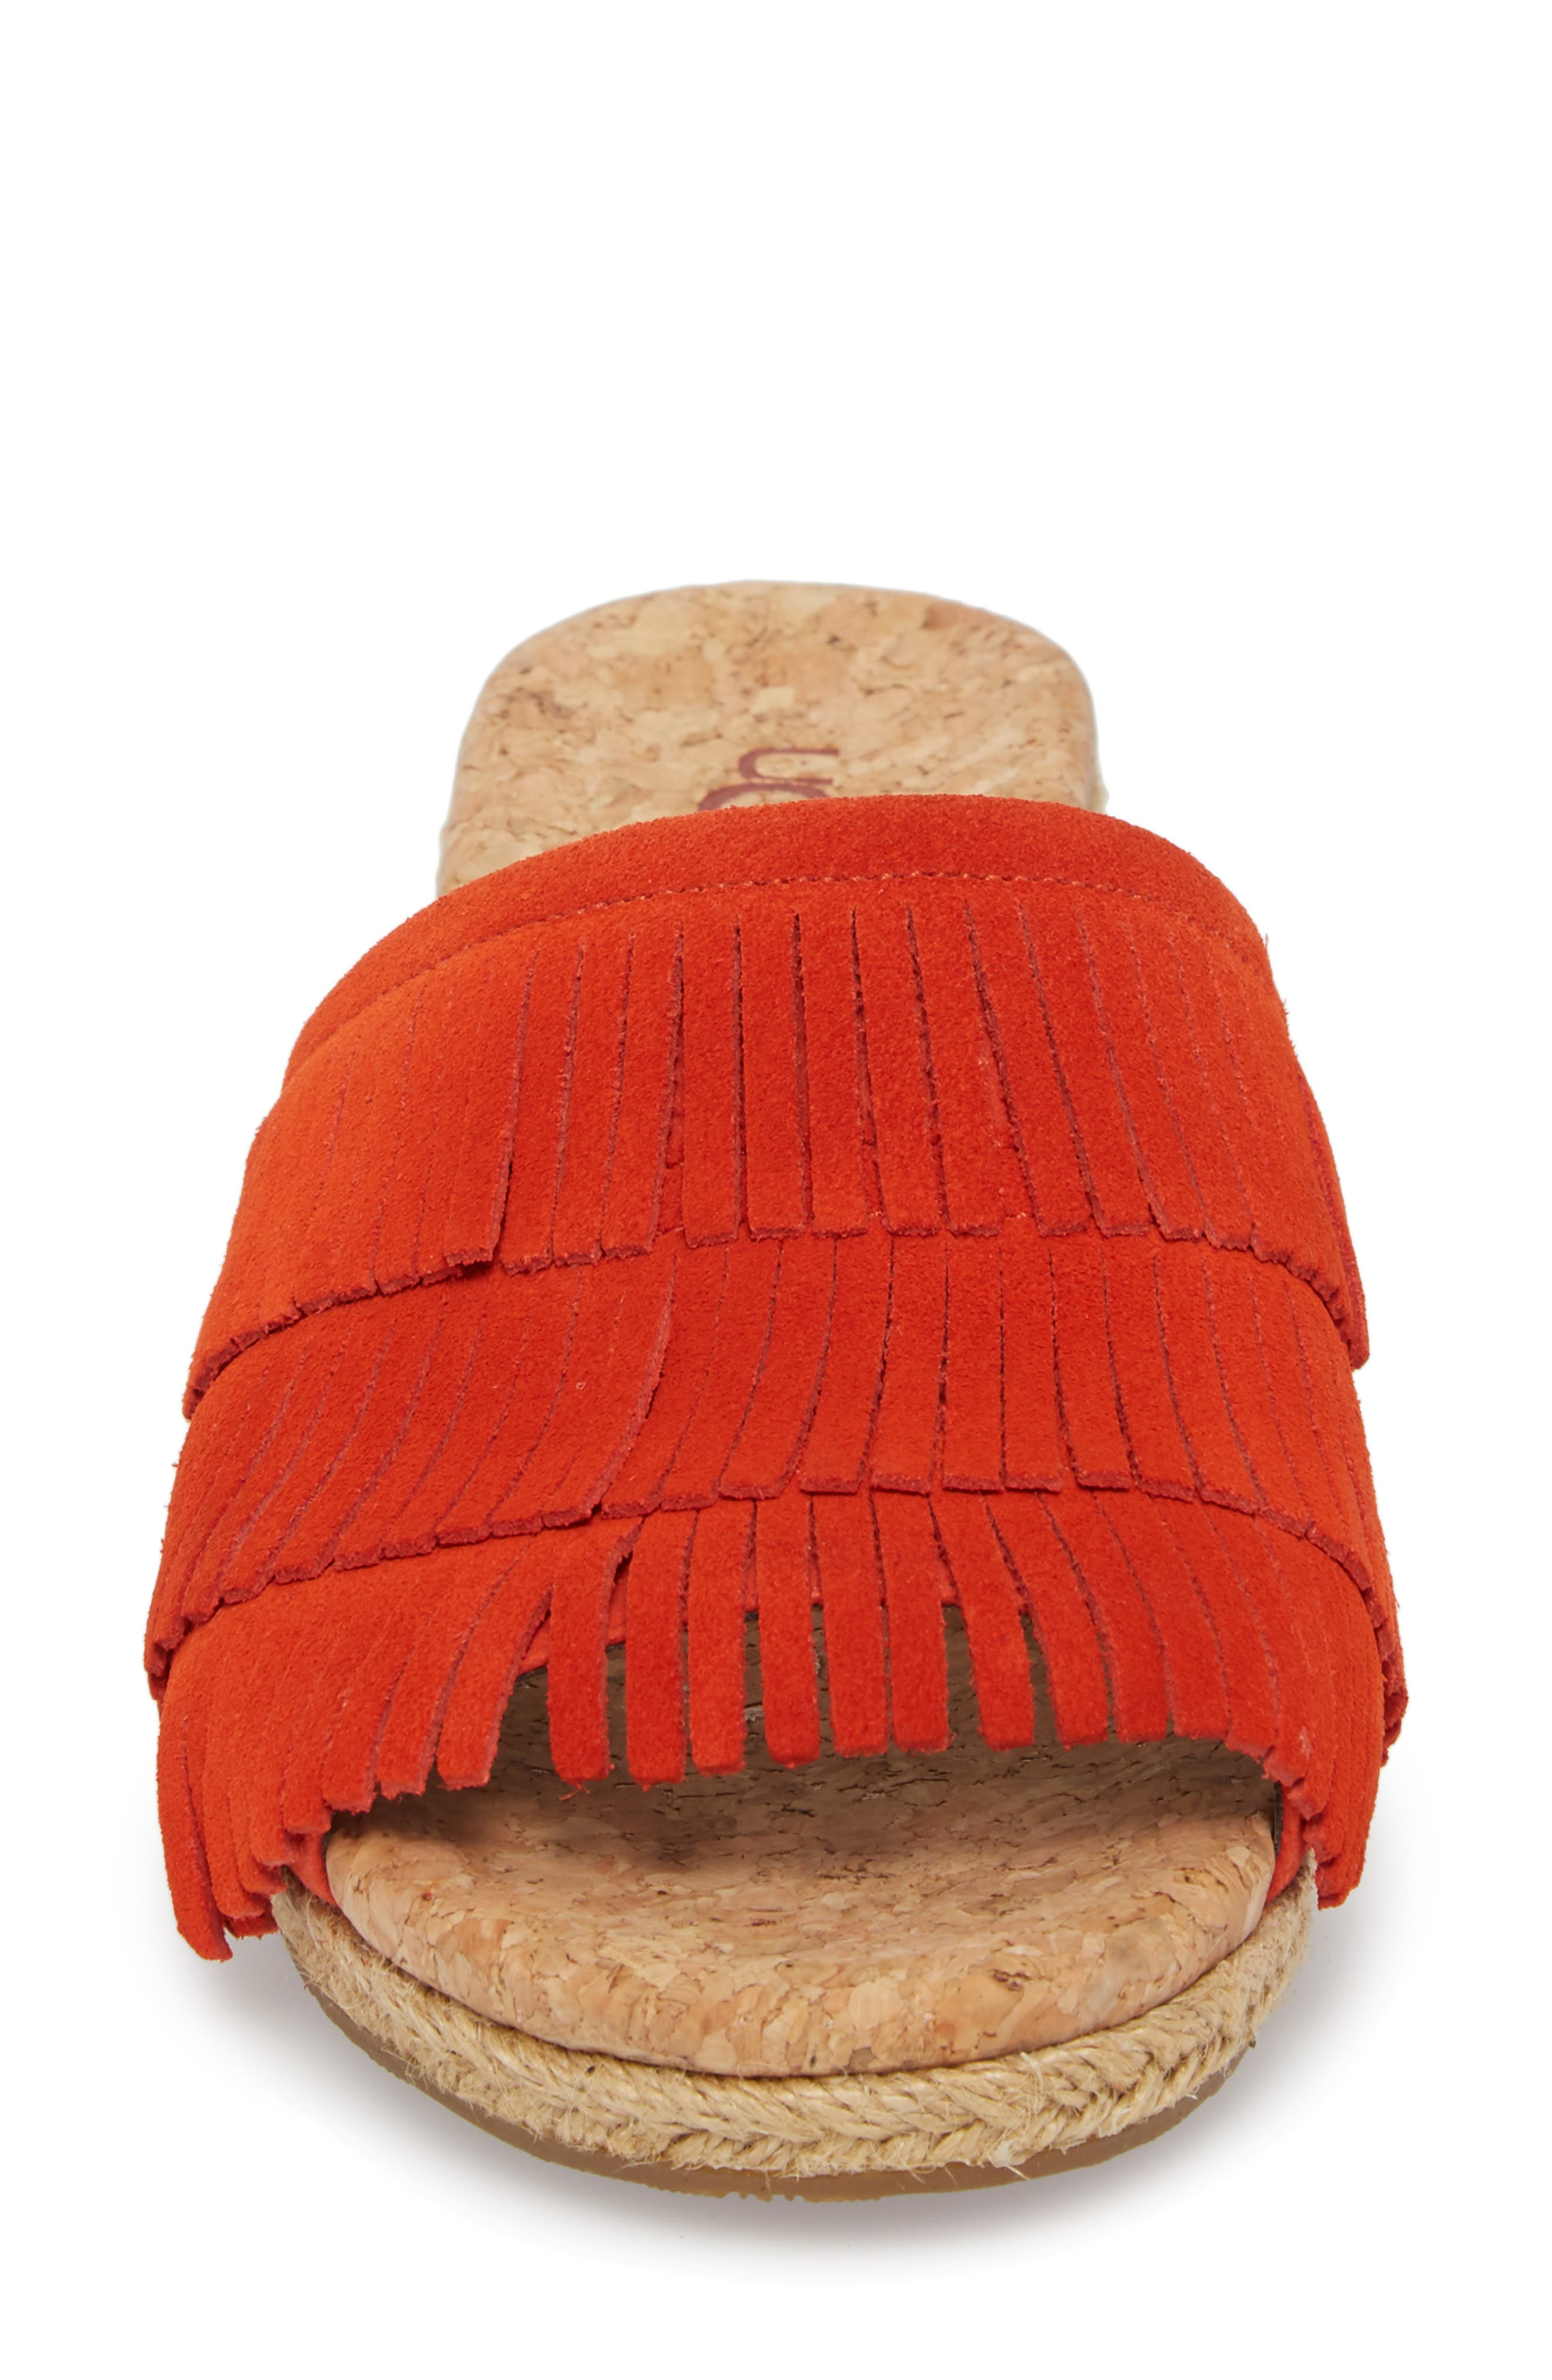 Kendra Fringe Wedge Sandal,                             Alternate thumbnail 4, color,                             Red Orange